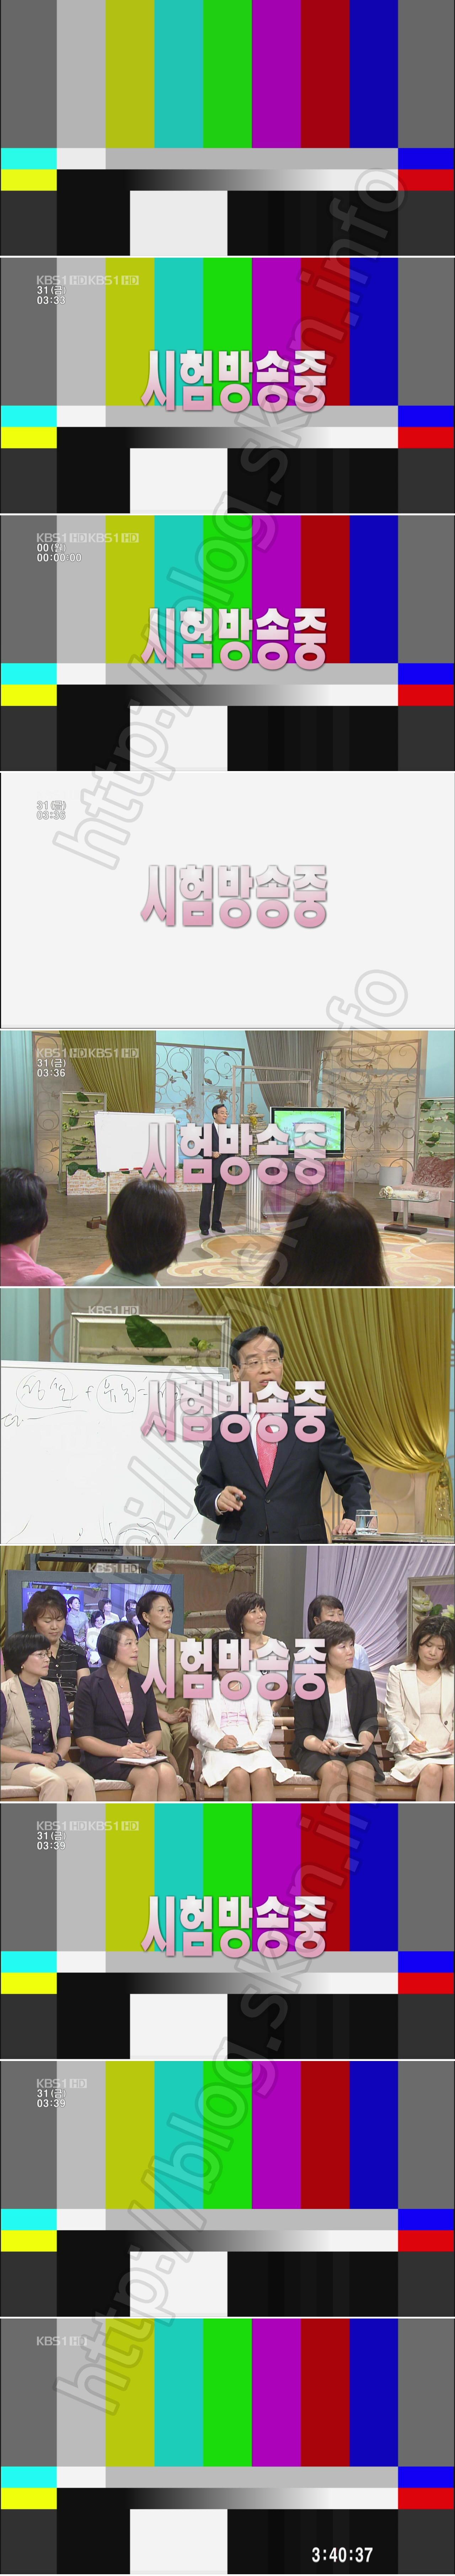 KBS-D1 시험방송 이미지